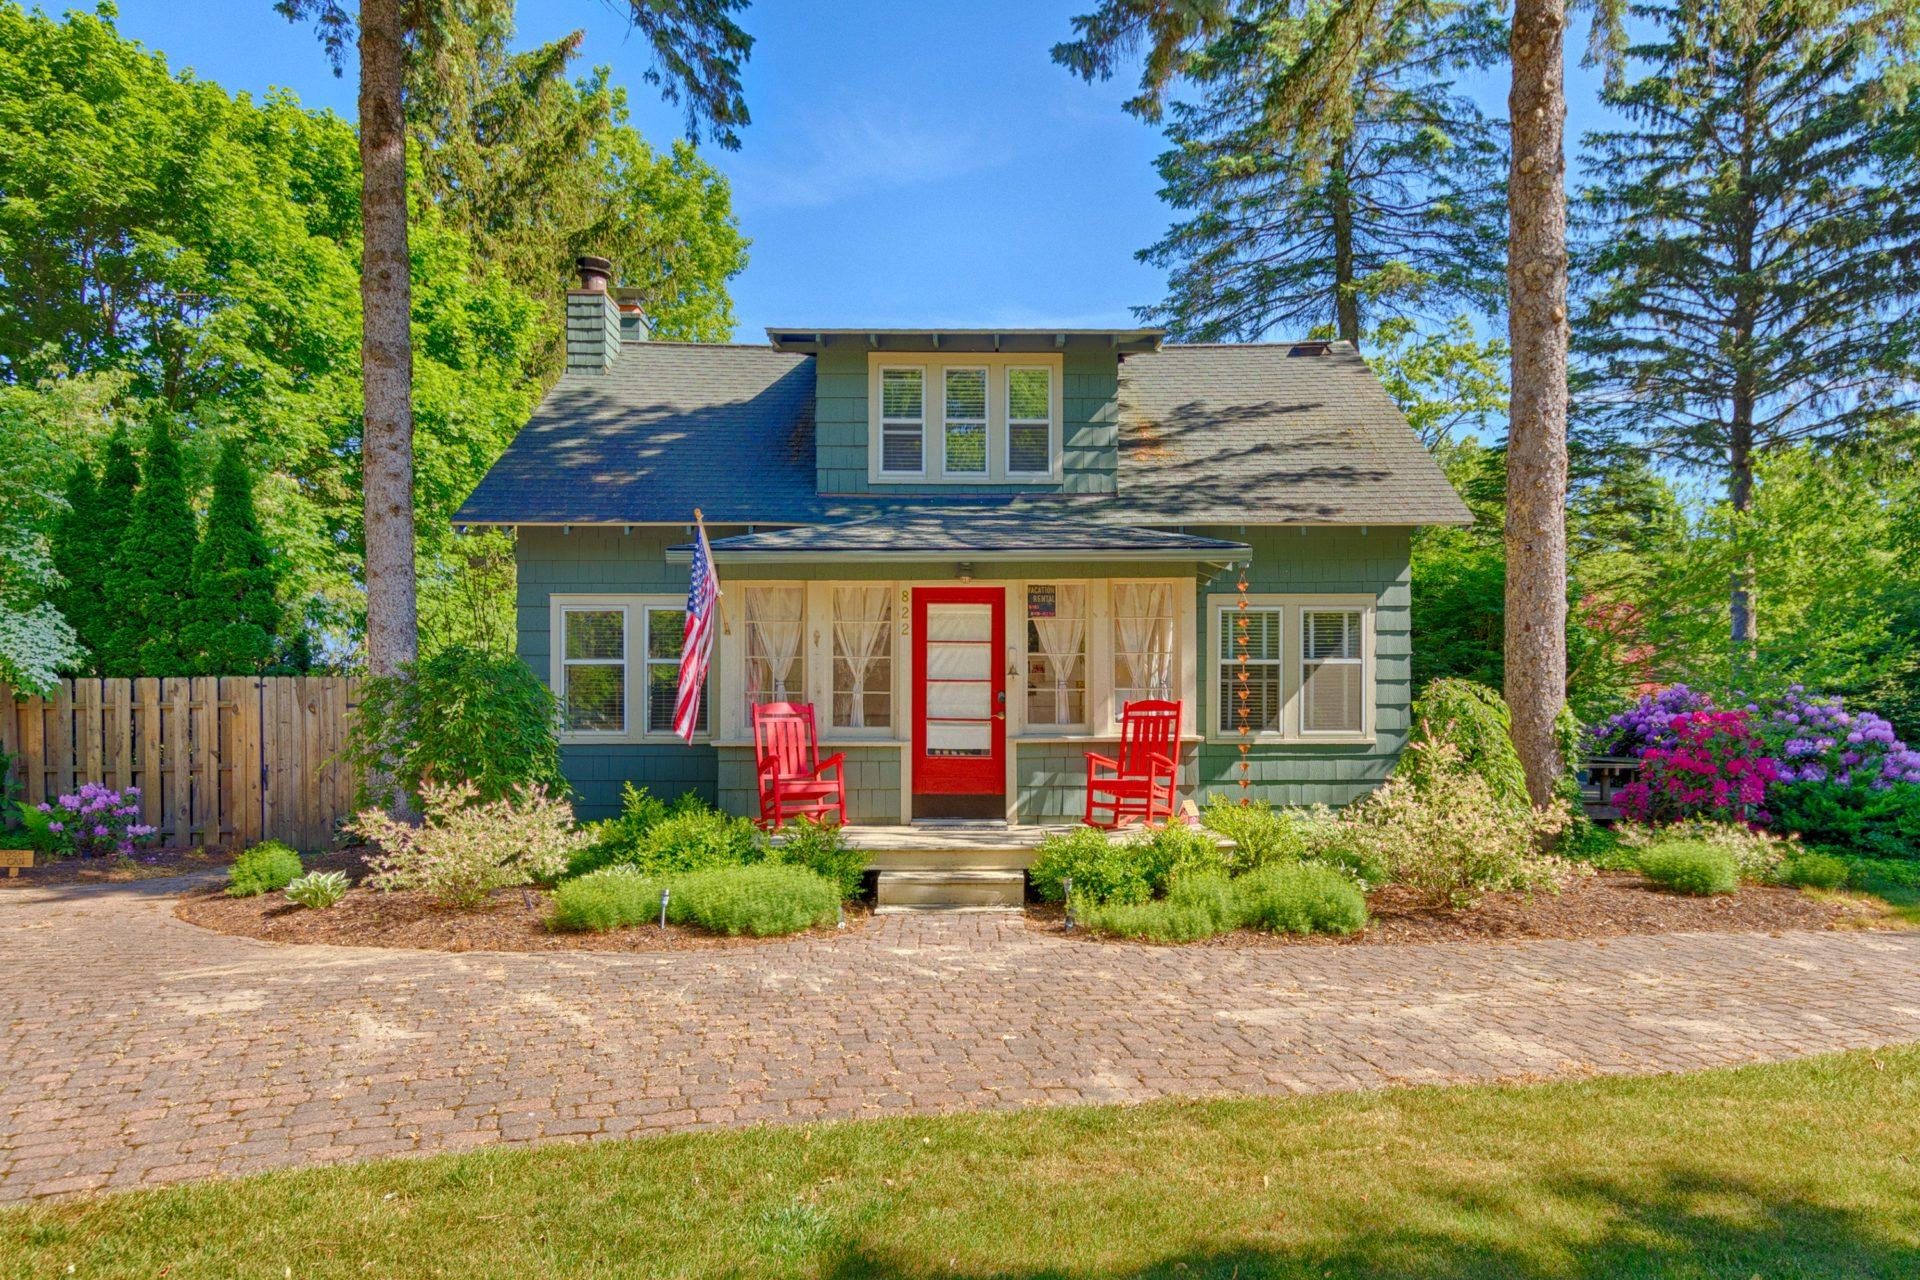 The Cabernet Cottage Saugatuck Vacation Rental Cottage